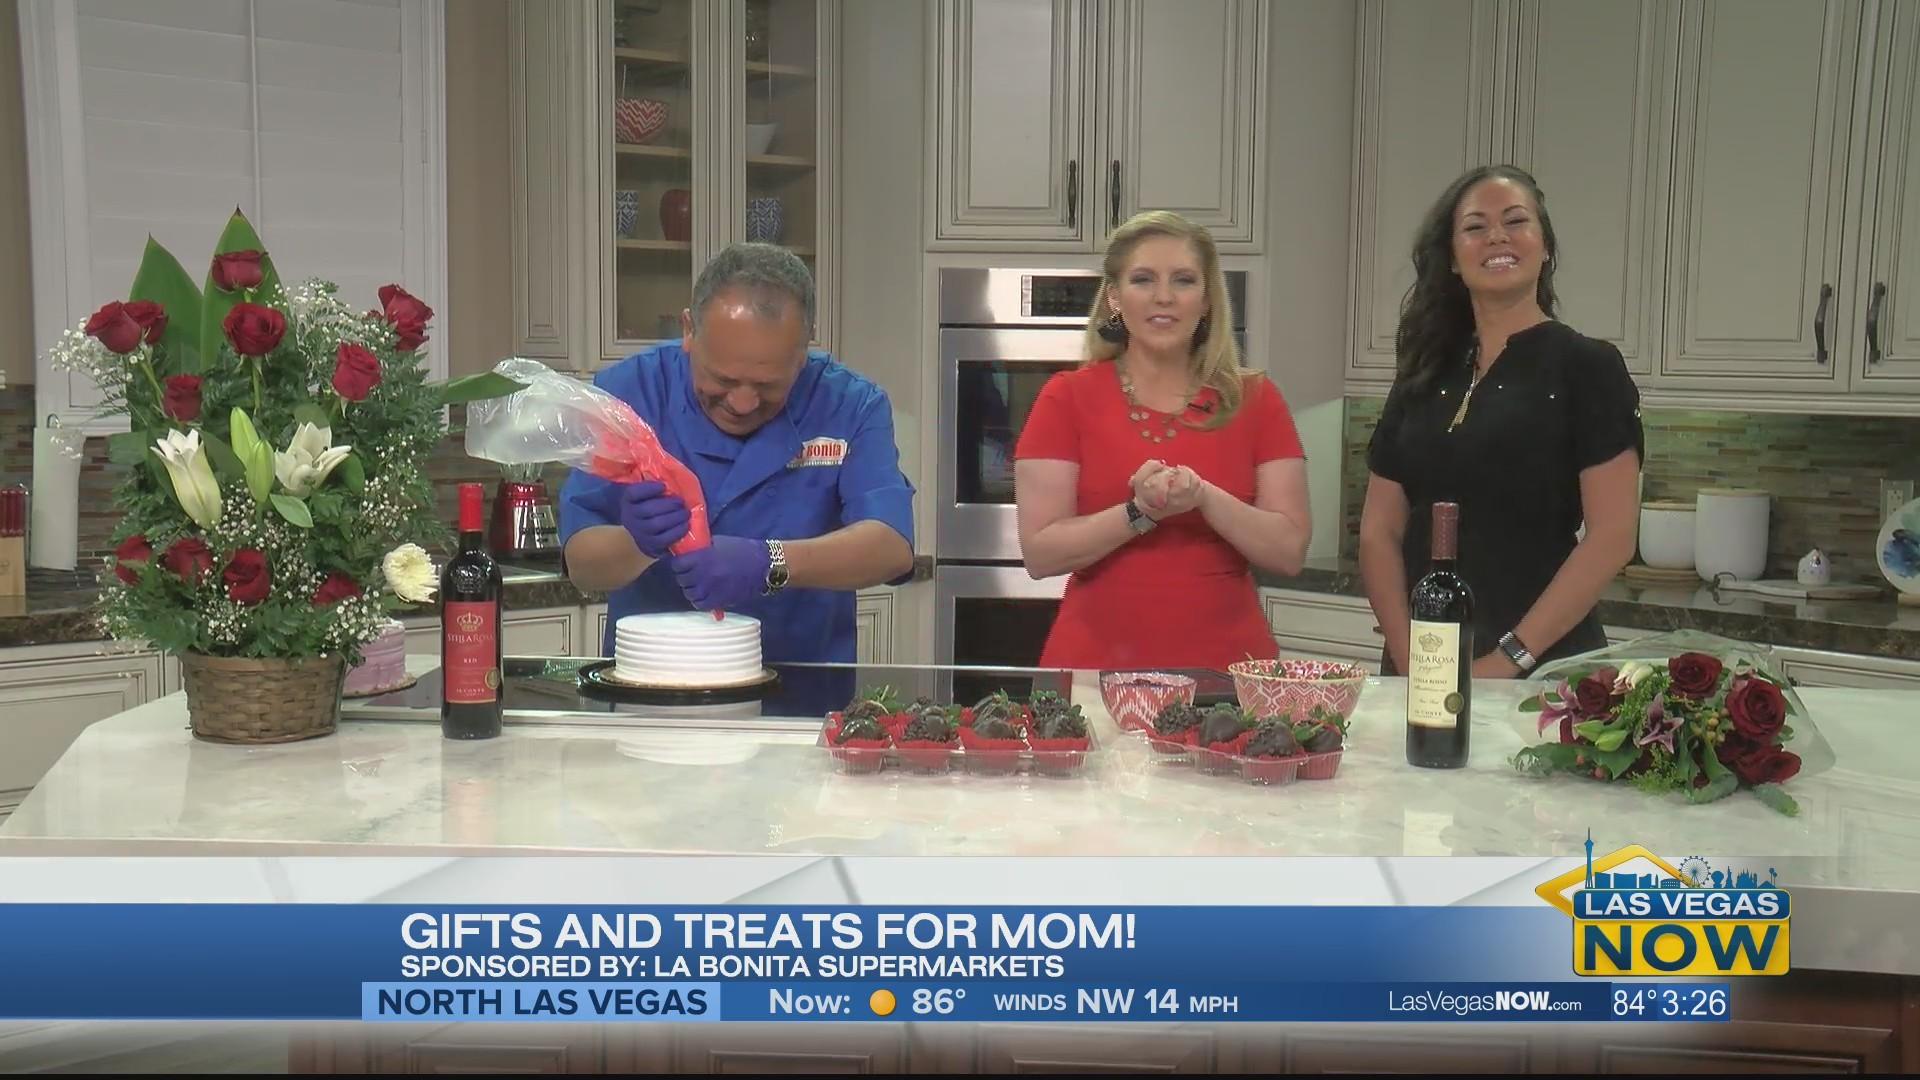 Gifts and treats for mom with La Bonita